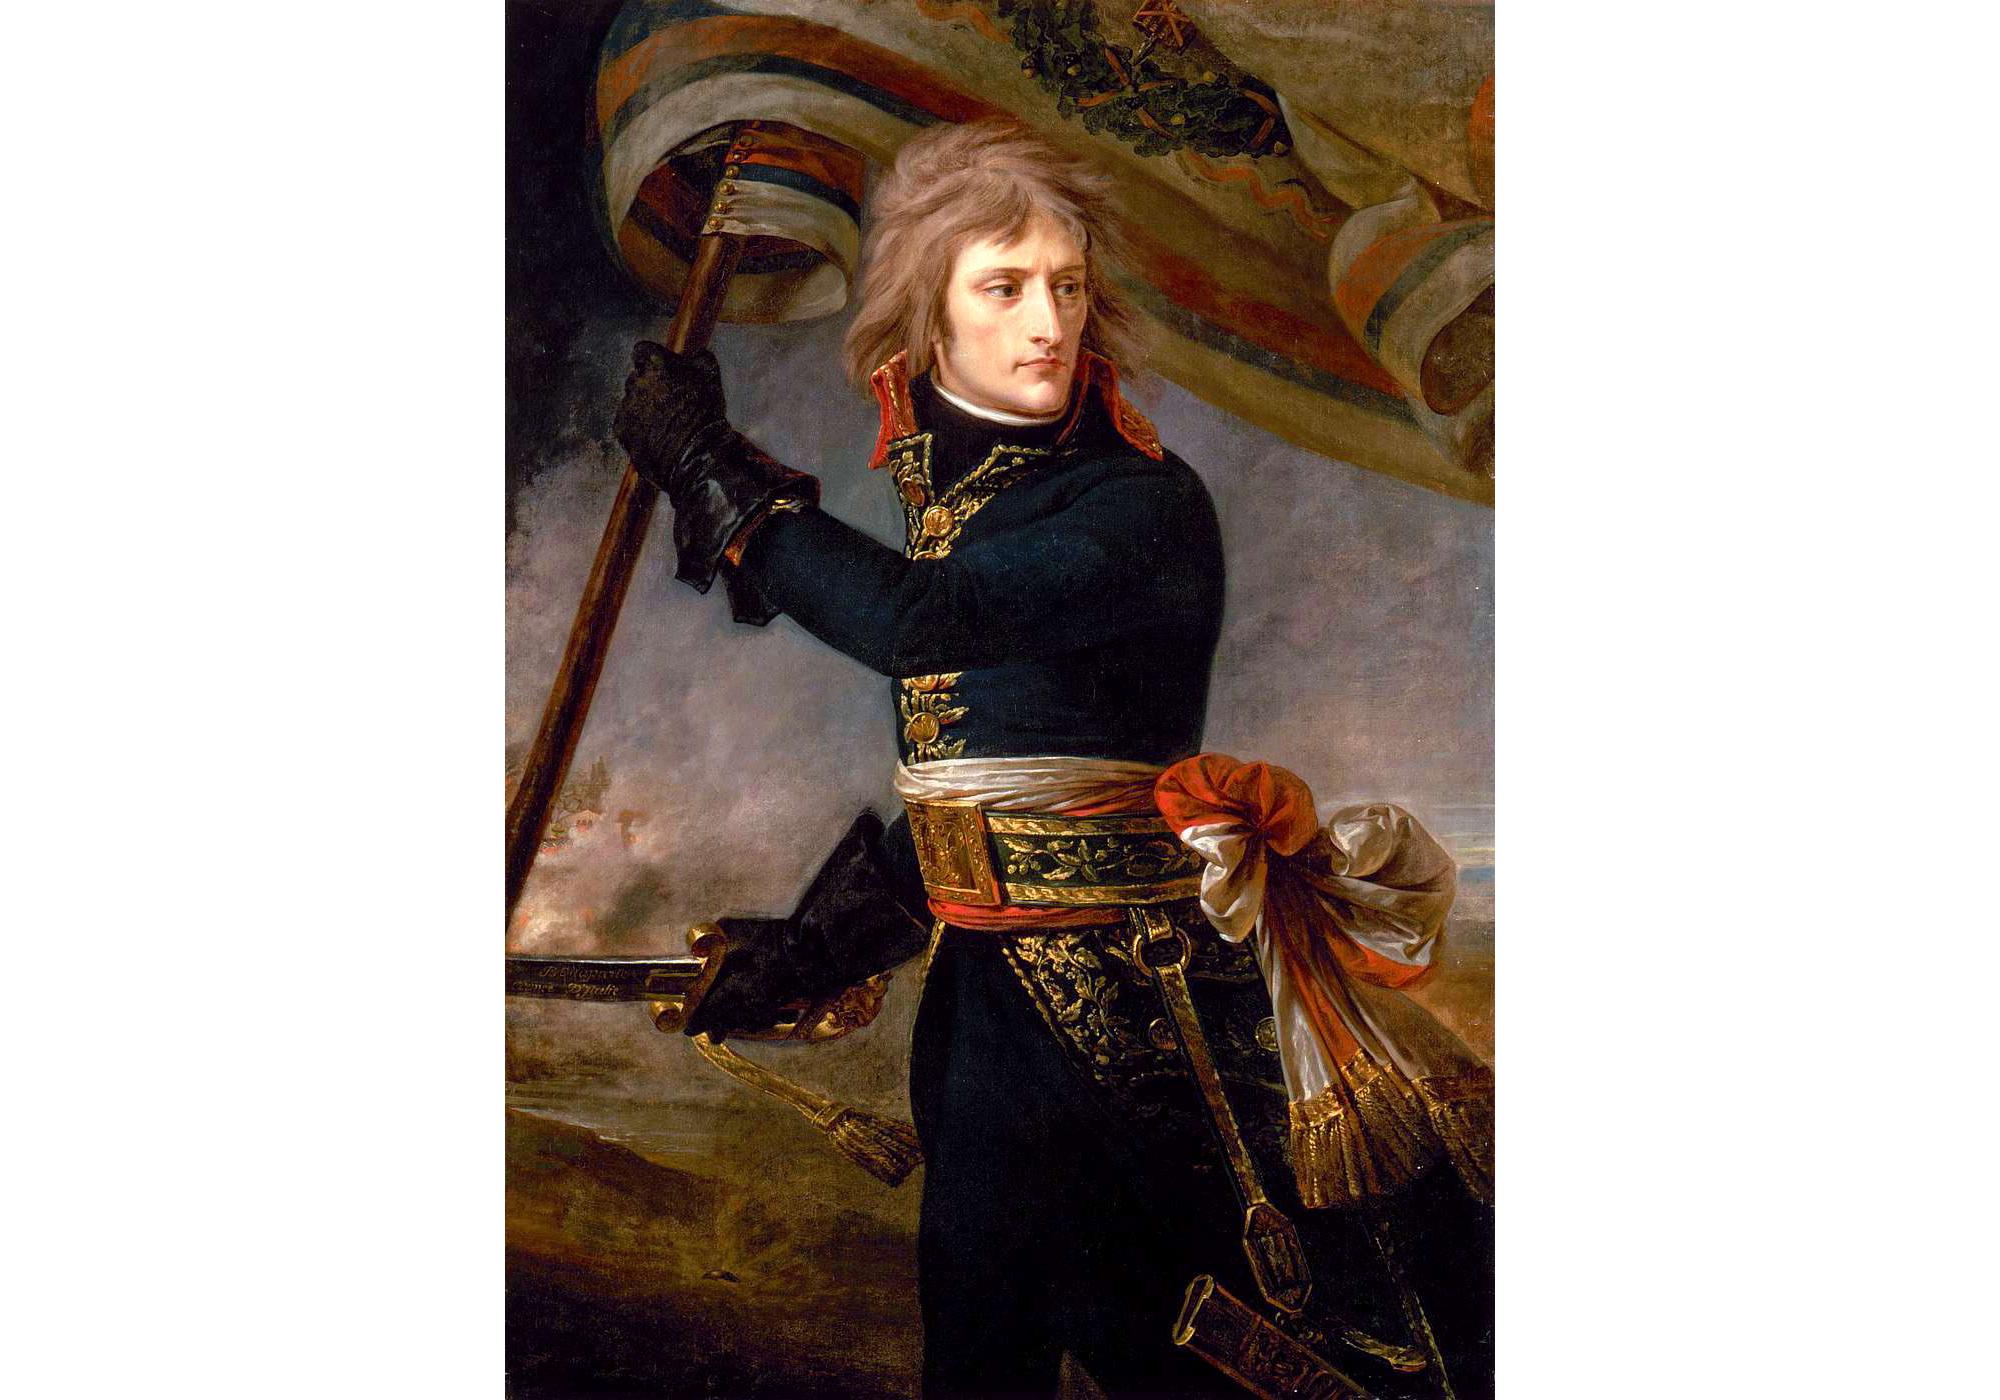 Bonaparte at the Pont d'Arcole, Antoine-Jean Gros - Age of Revolution